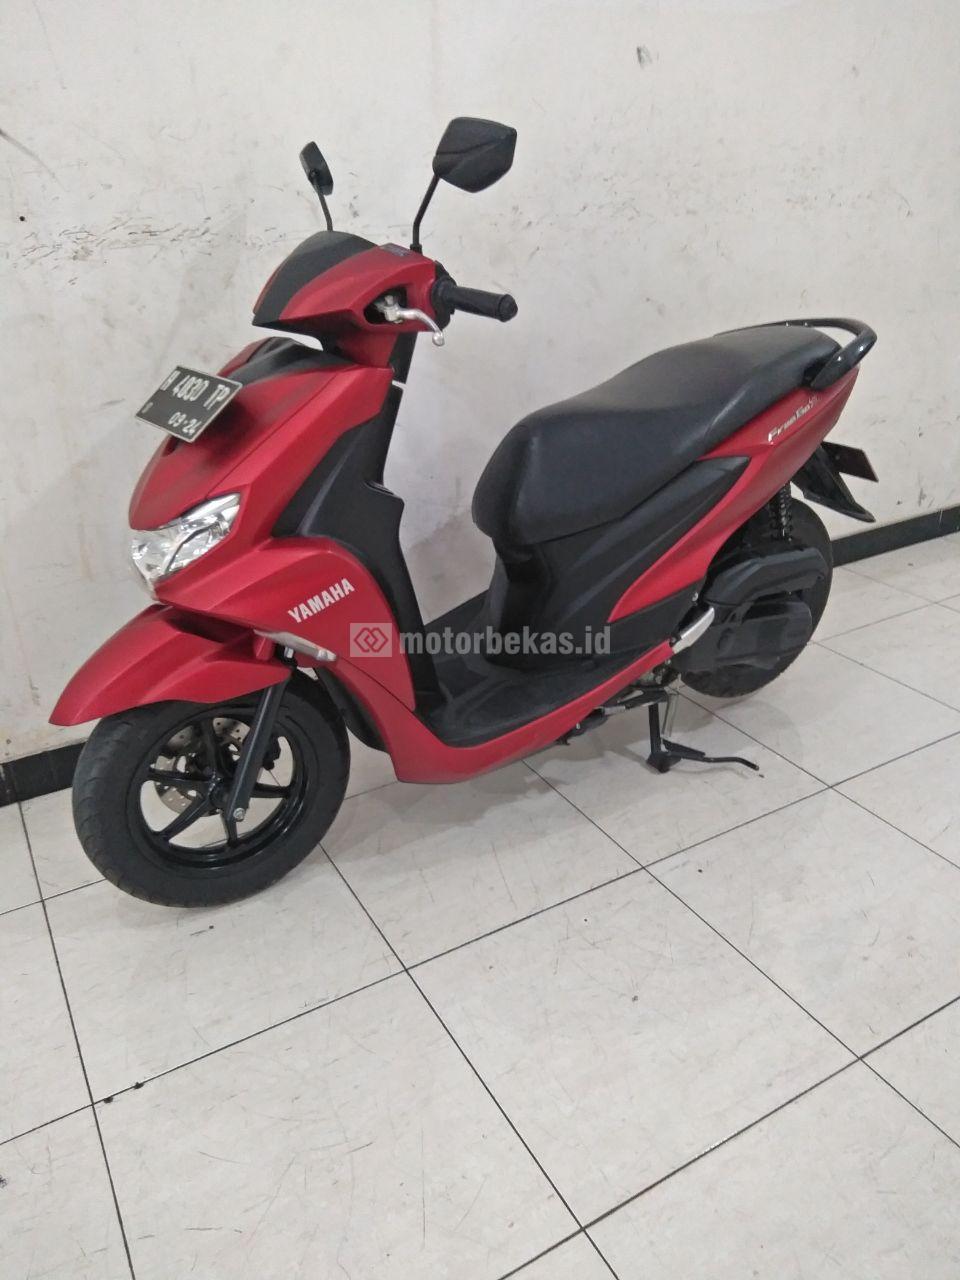 YAMAHA FREE GO S  4303 motorbekas.id